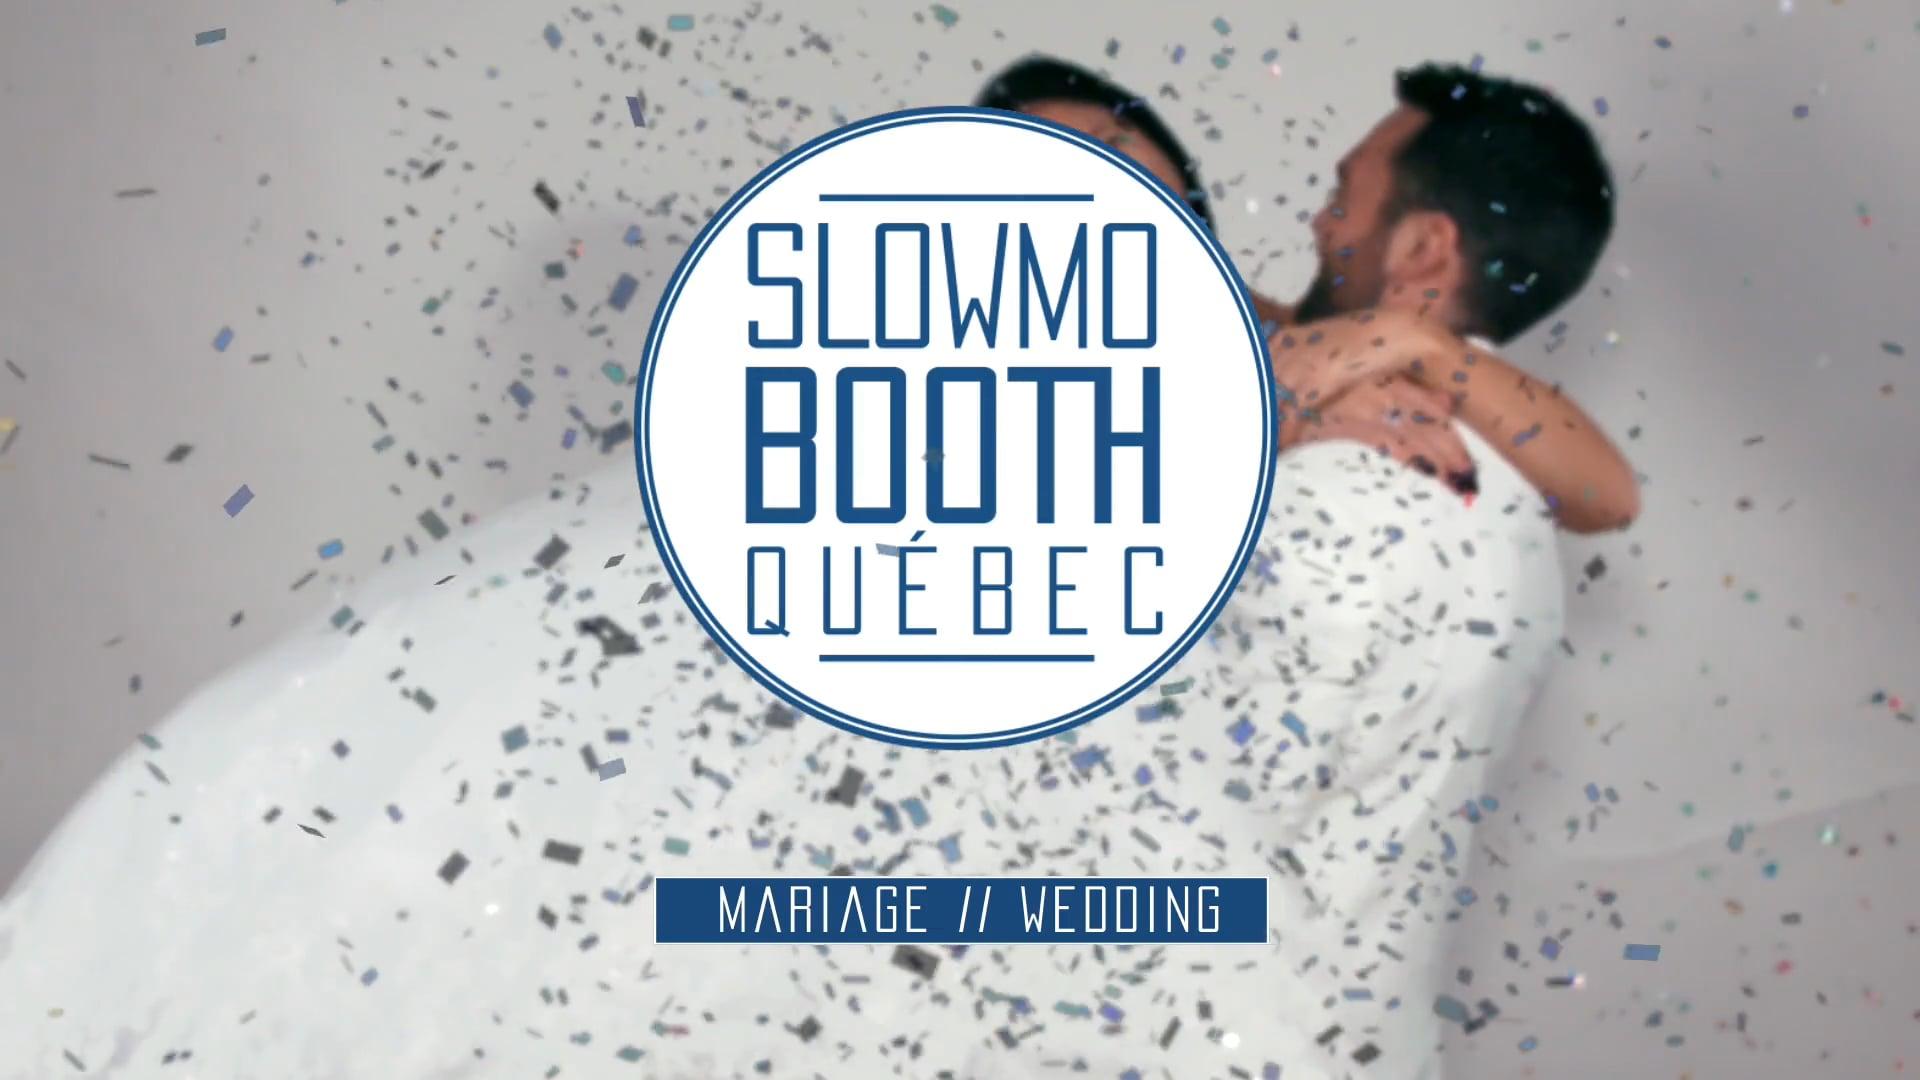 Slowmo booth Québec Mariage // wedding